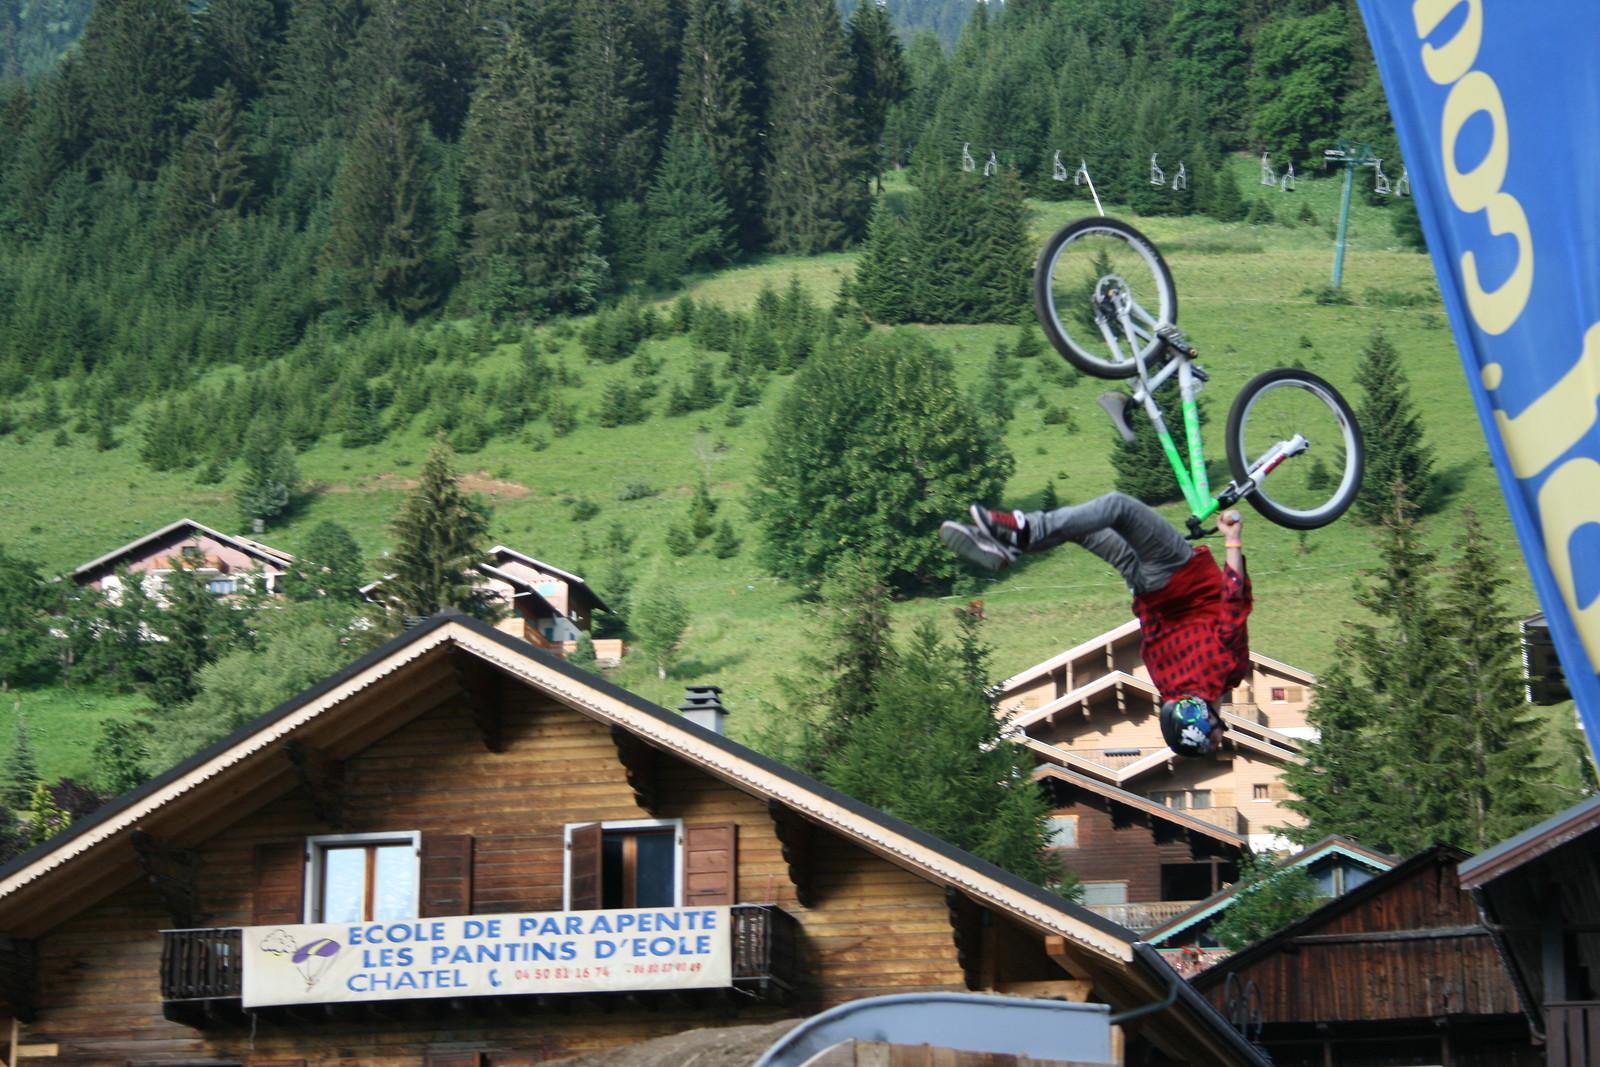 AGGY at Châtel - Matthias - Mountain Biking Pictures - Vital MTB